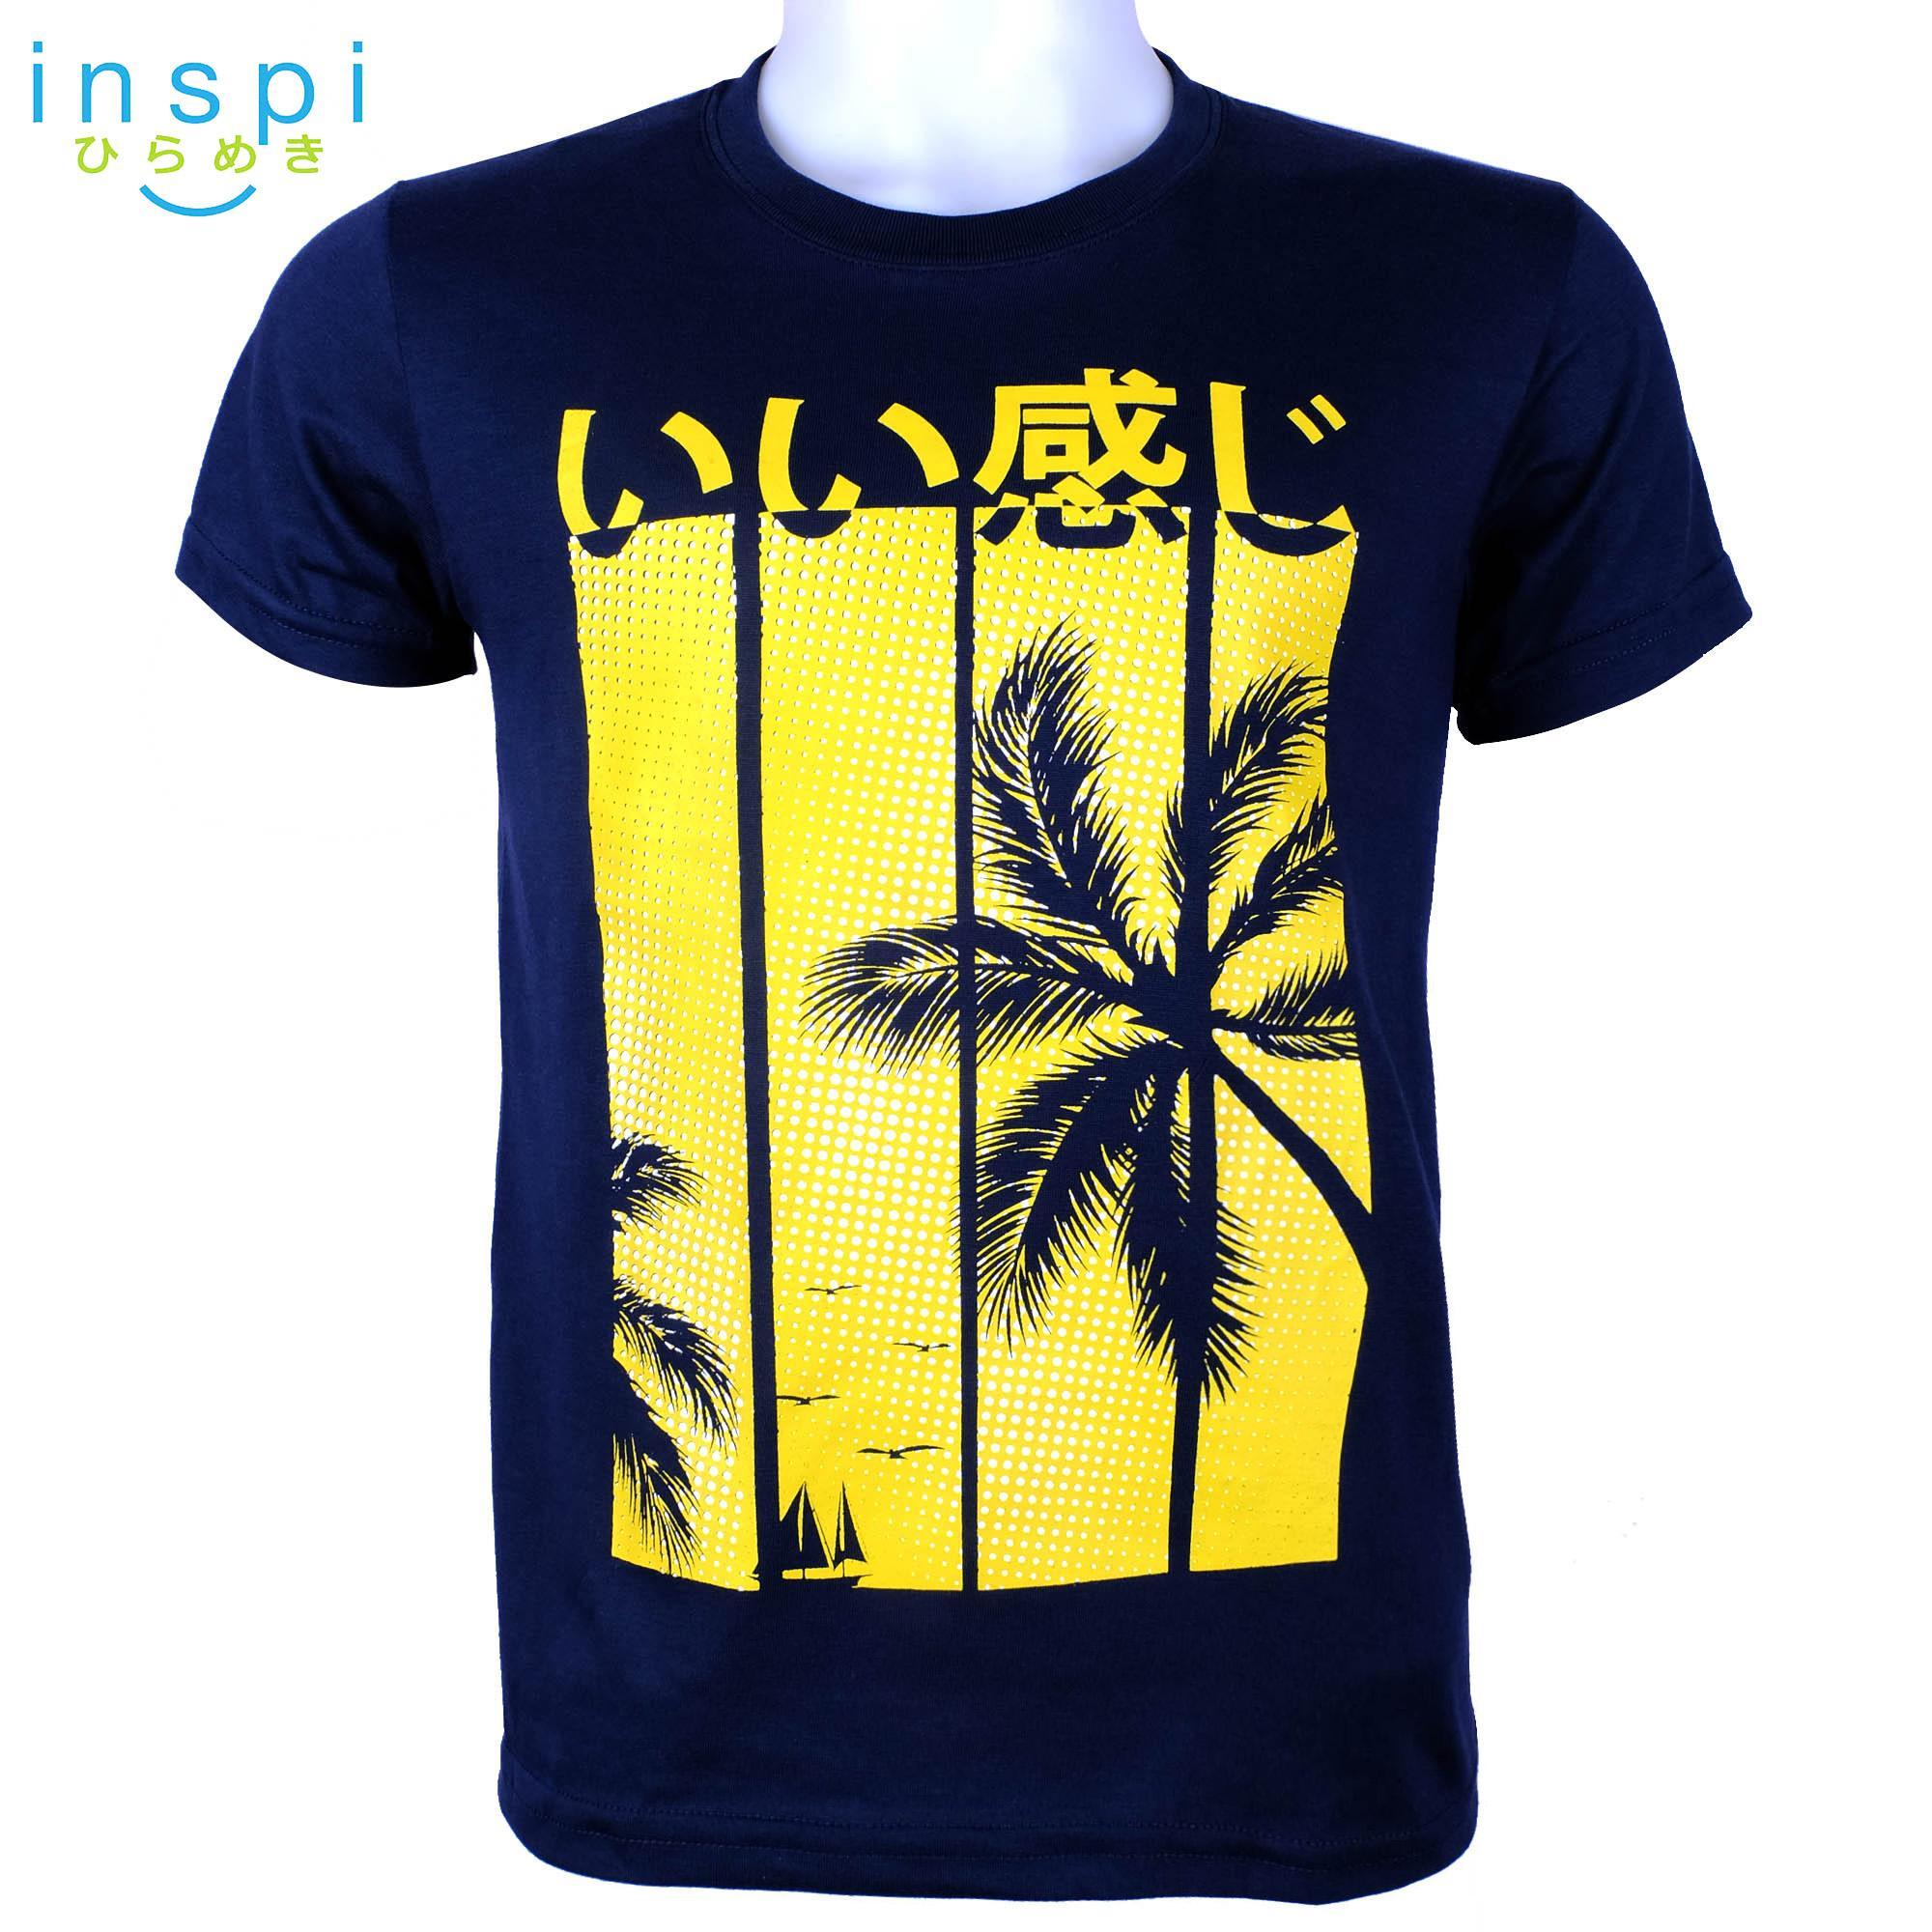 d0917b18ad0 INSPI Tees Coco (Navy Blue) tshirt printed graphic tee Mens t shirt shirts  for